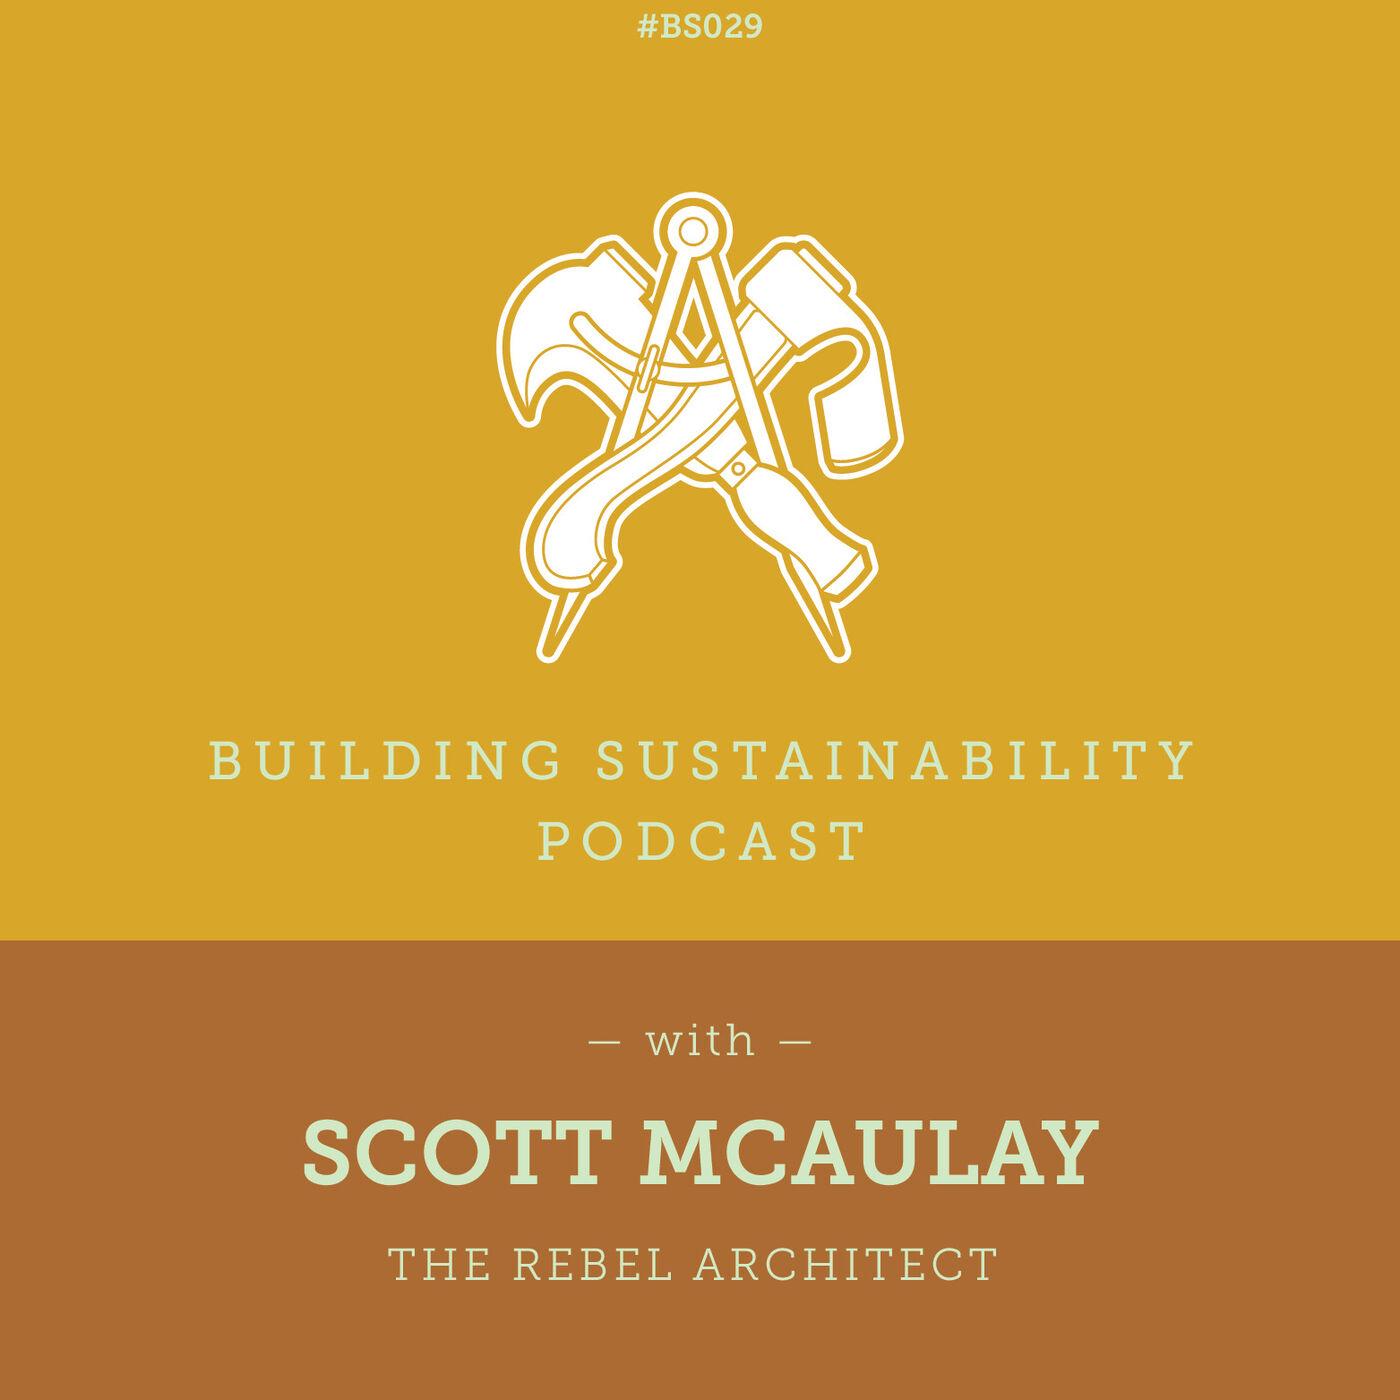 The Rebel Architect - Scott McAulay - BS029